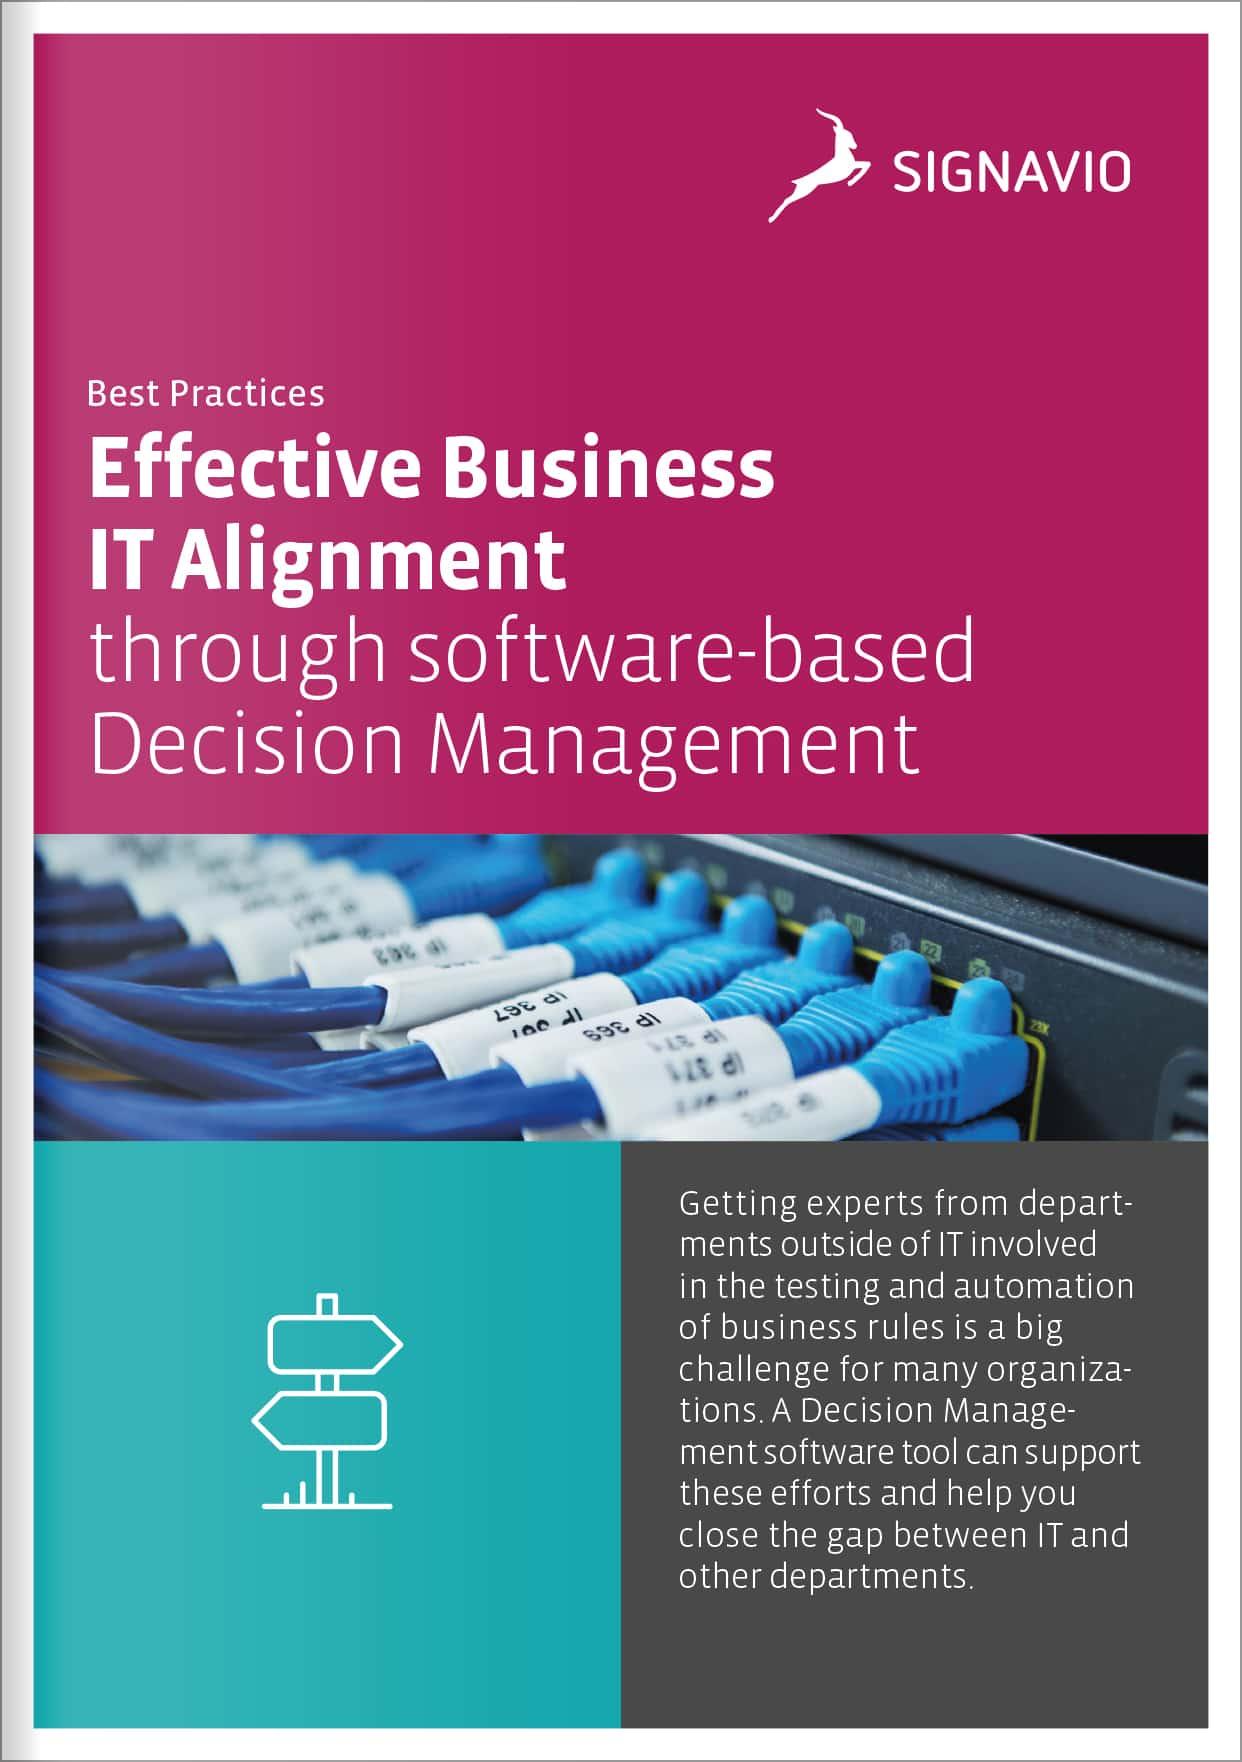 Signavio business and IT alignment